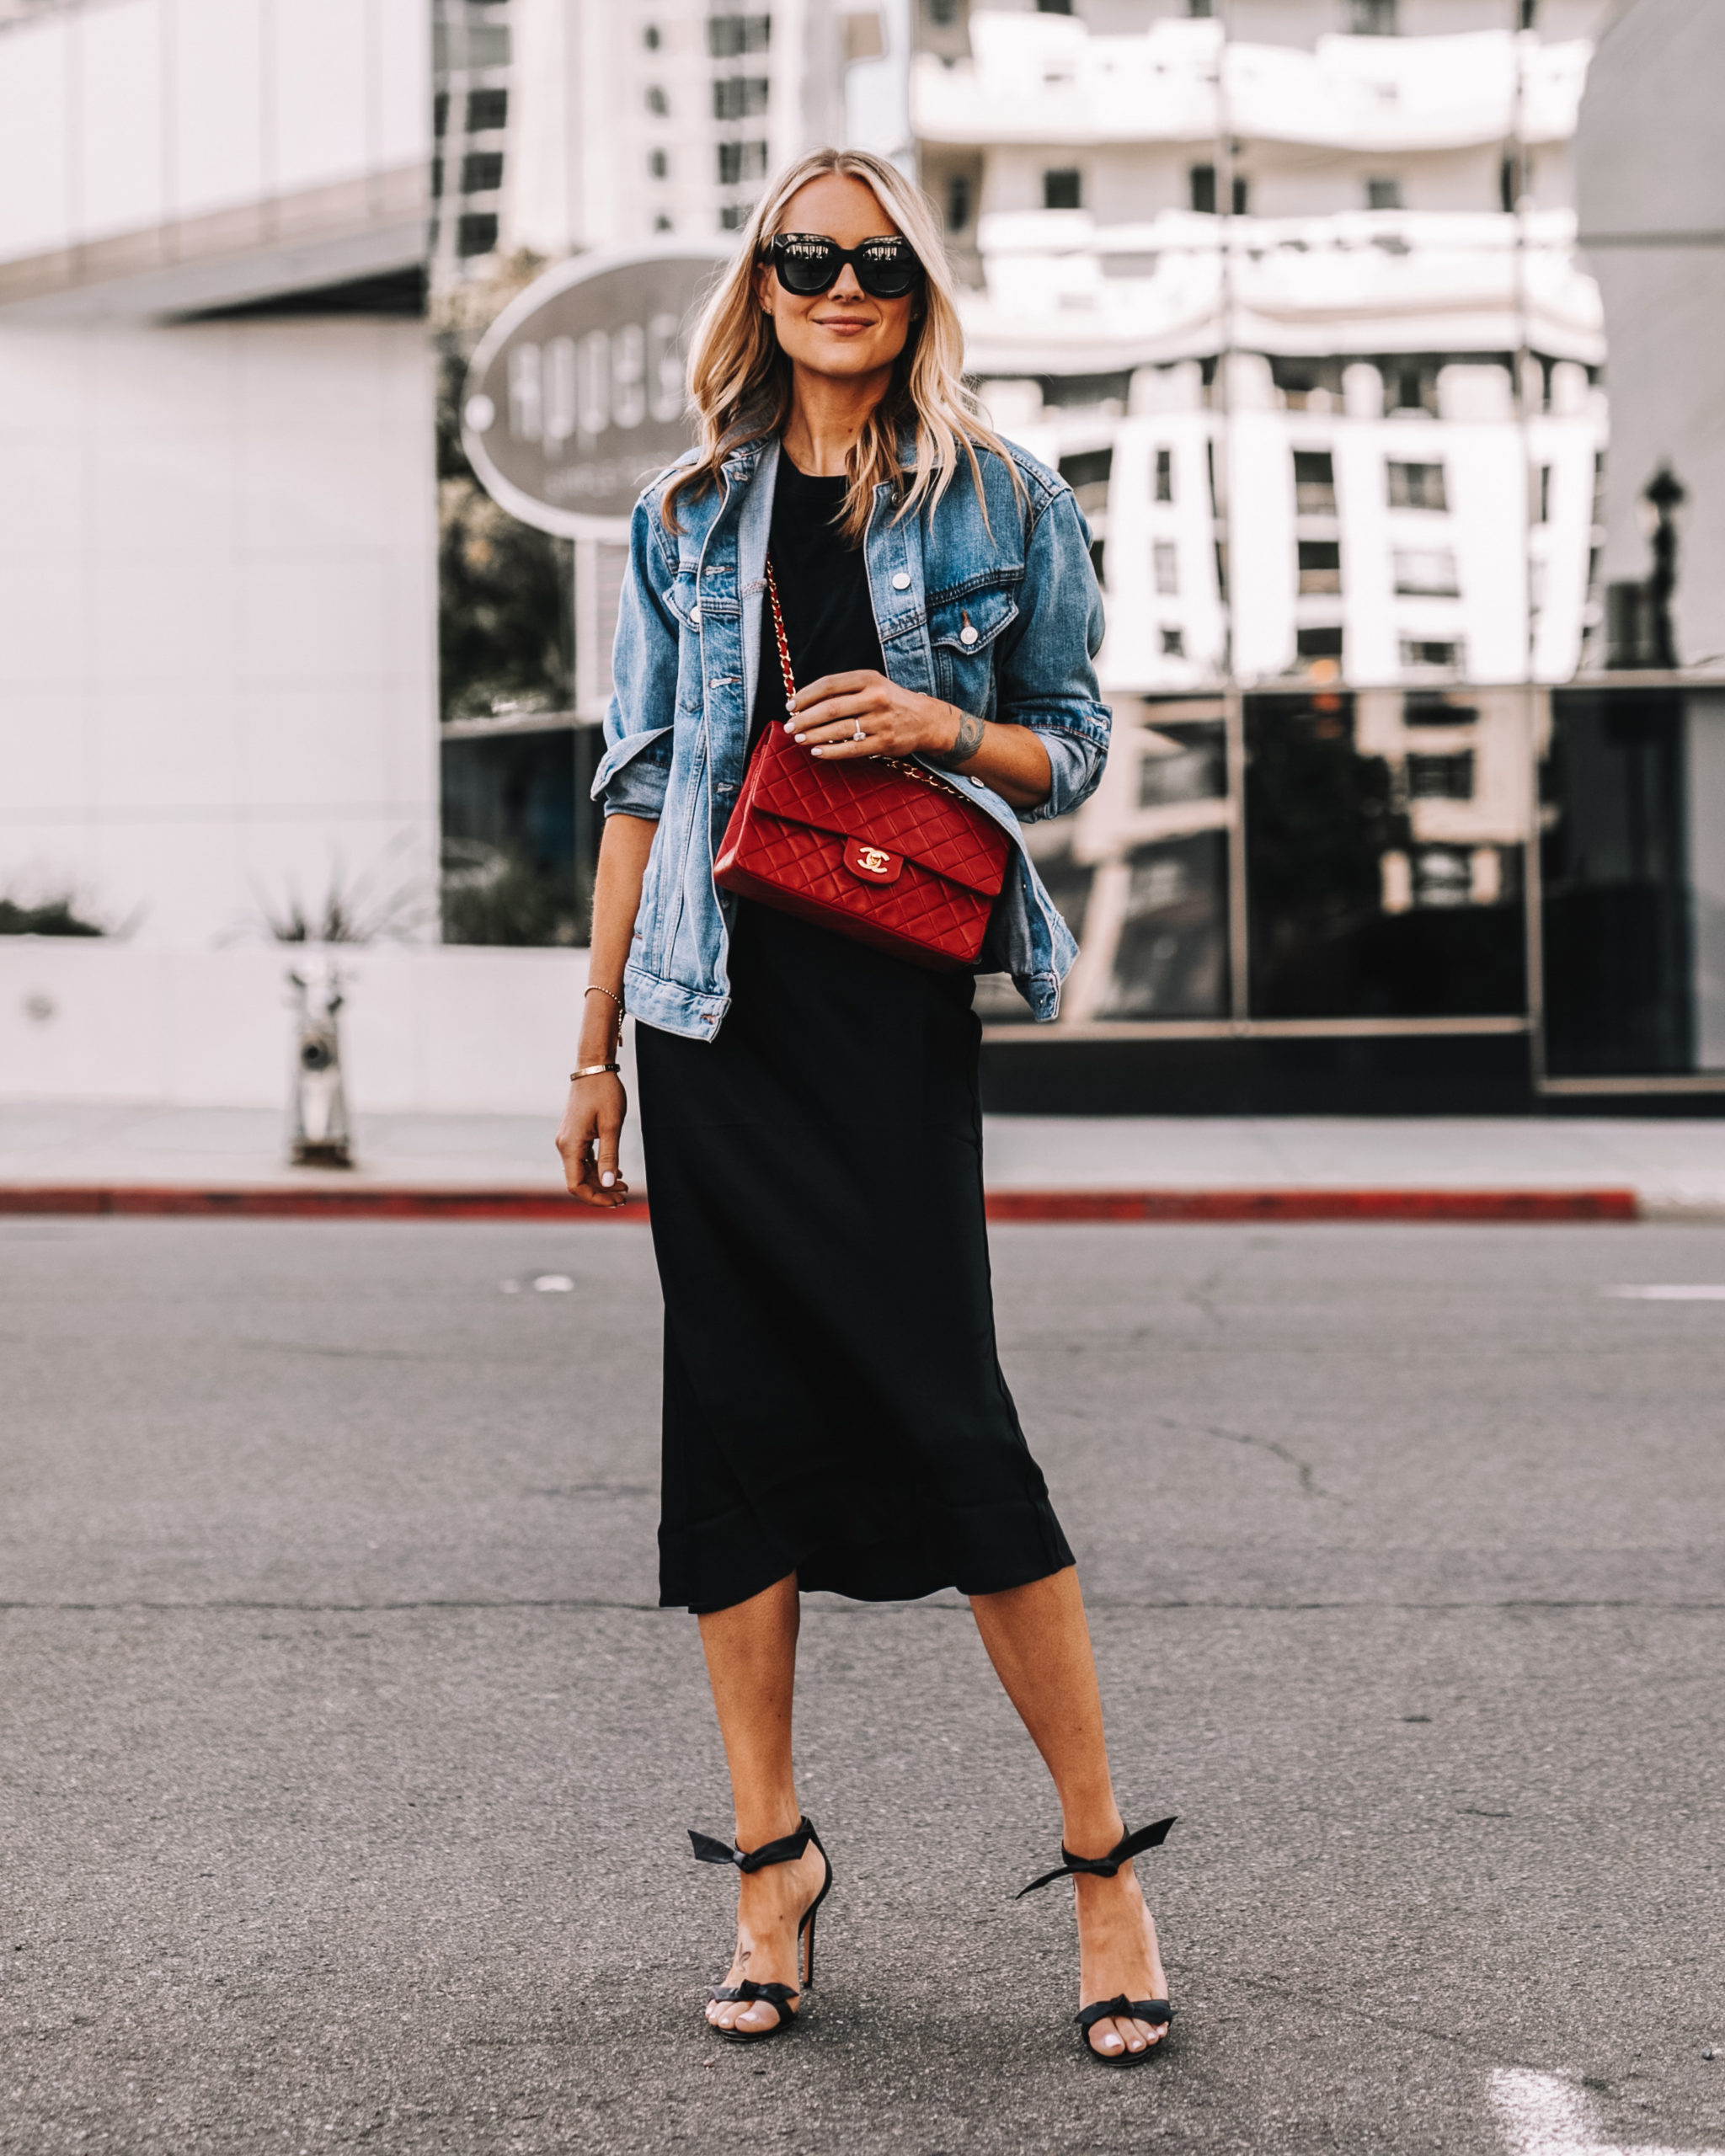 fashion jackson wearing oversized denim jacket black slip skirt red chanel handbag